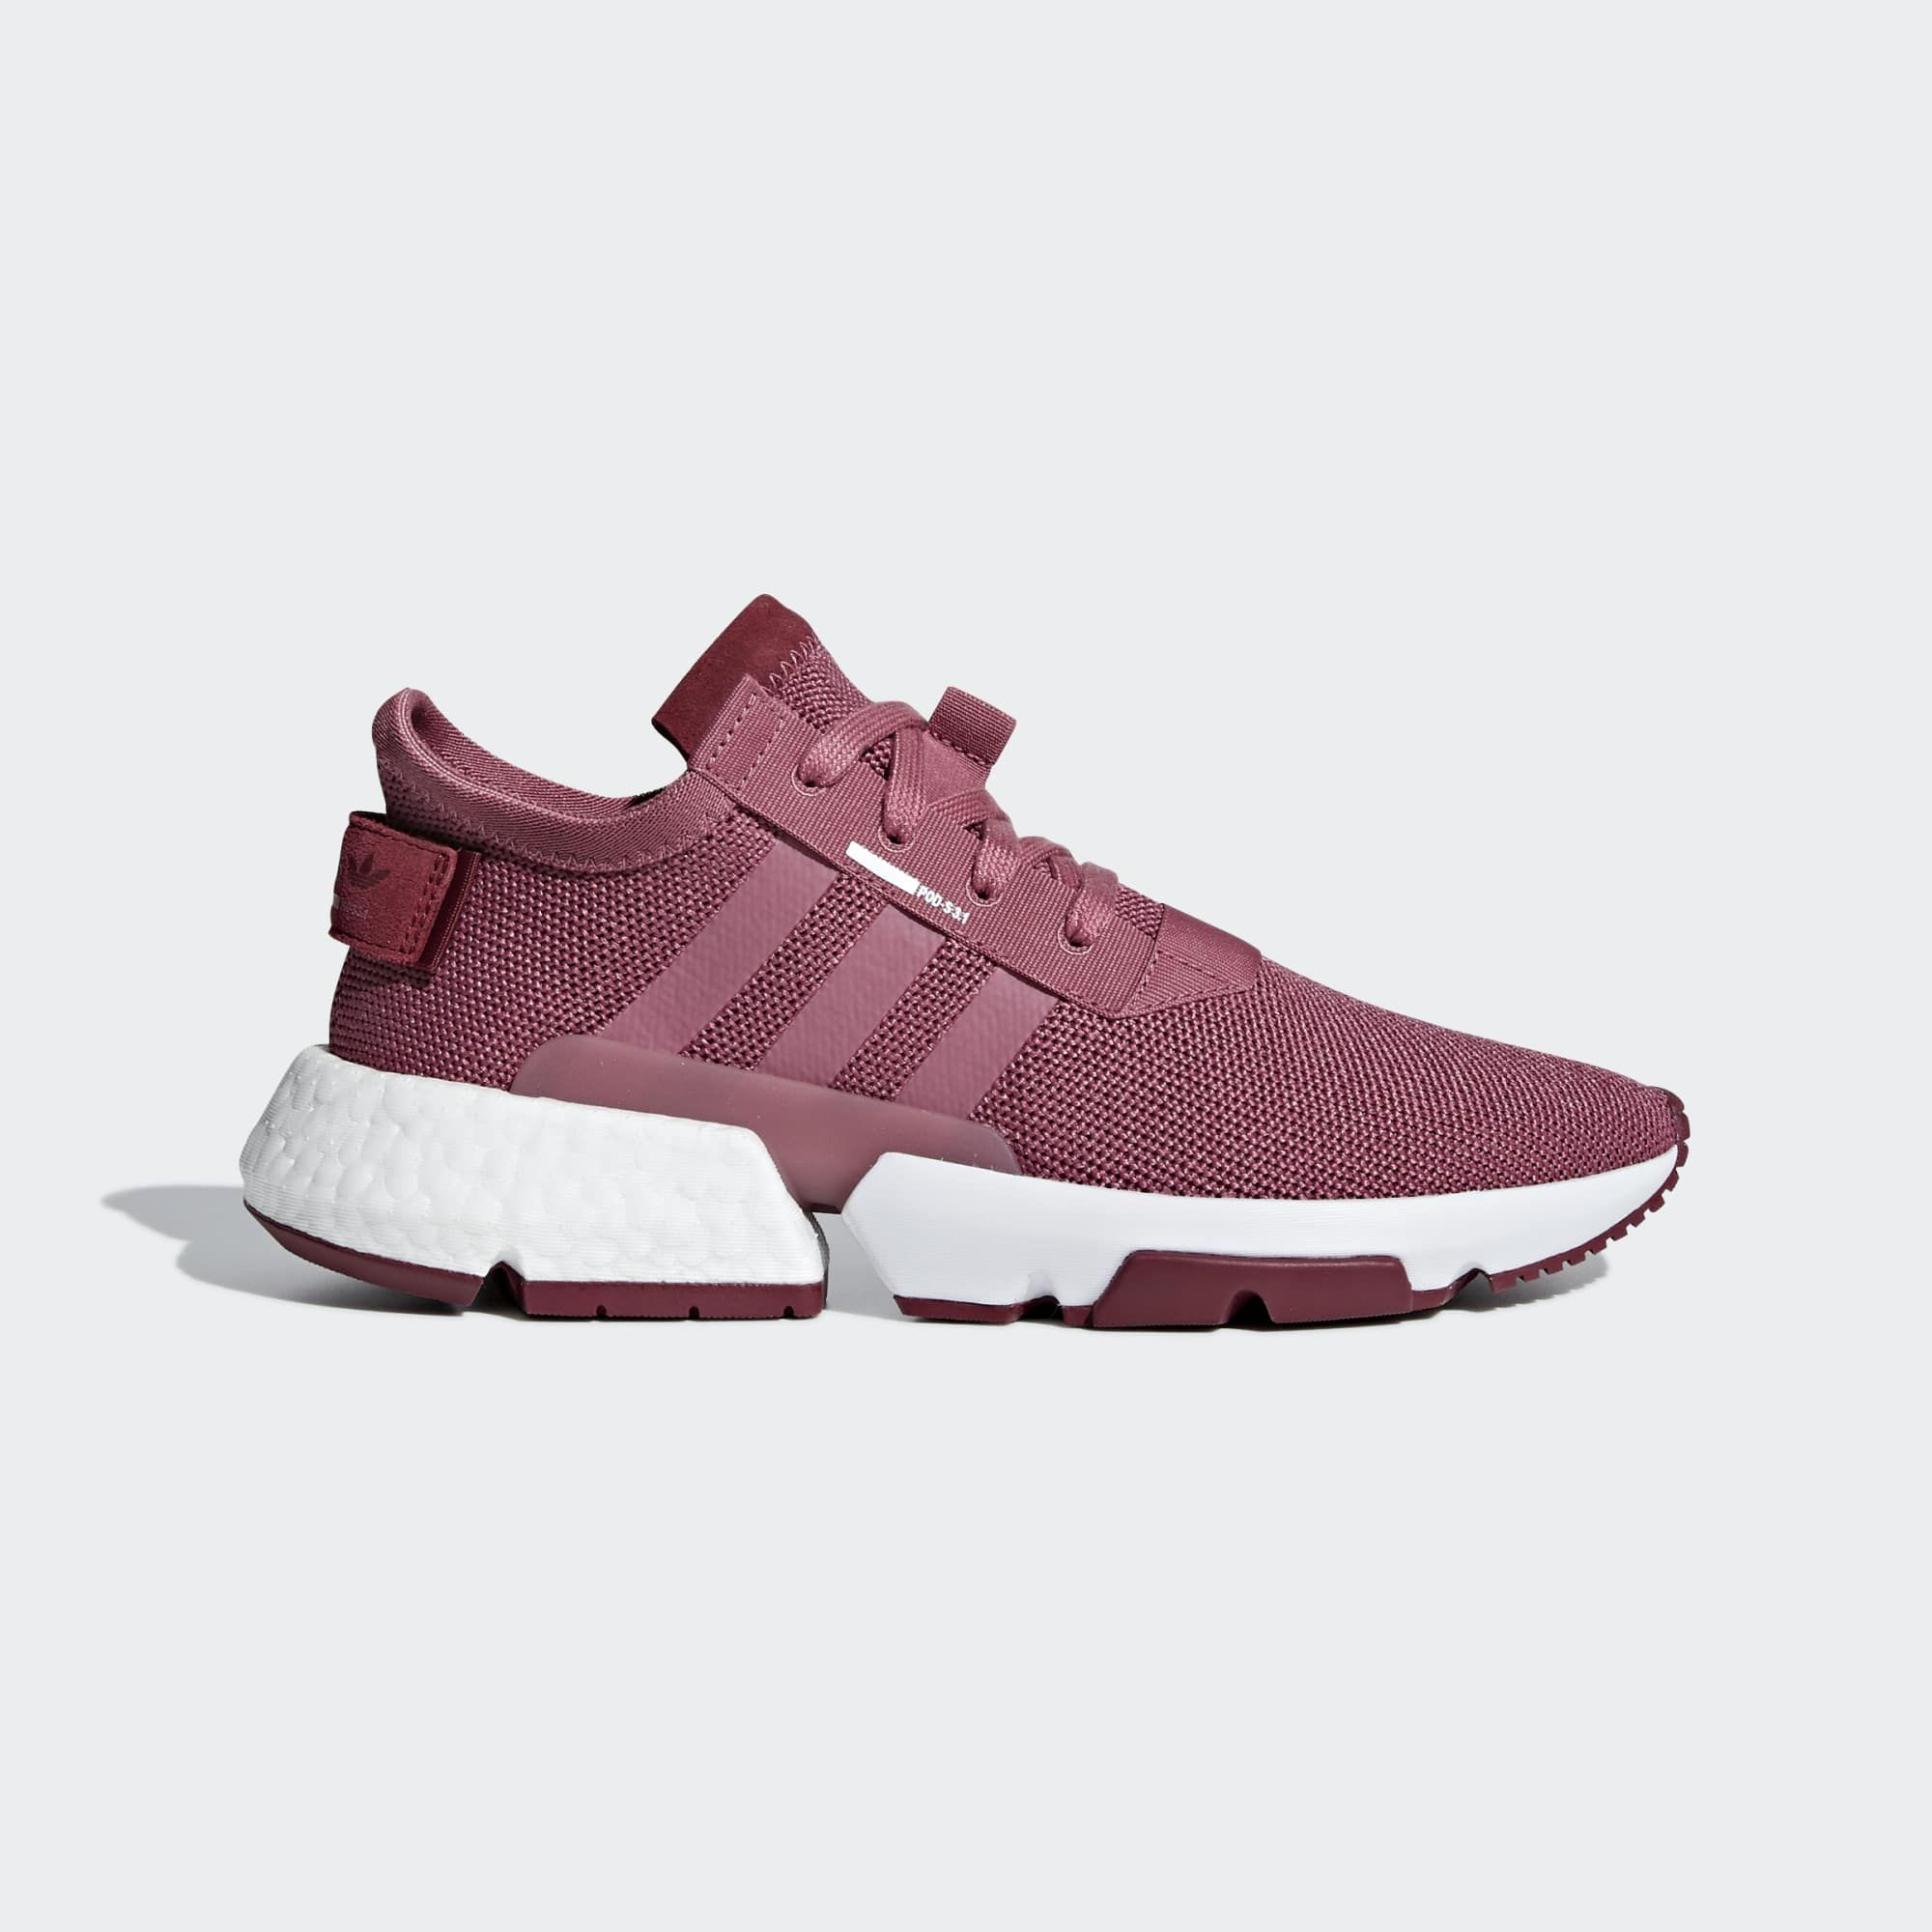 adidas zapatillas burgundy